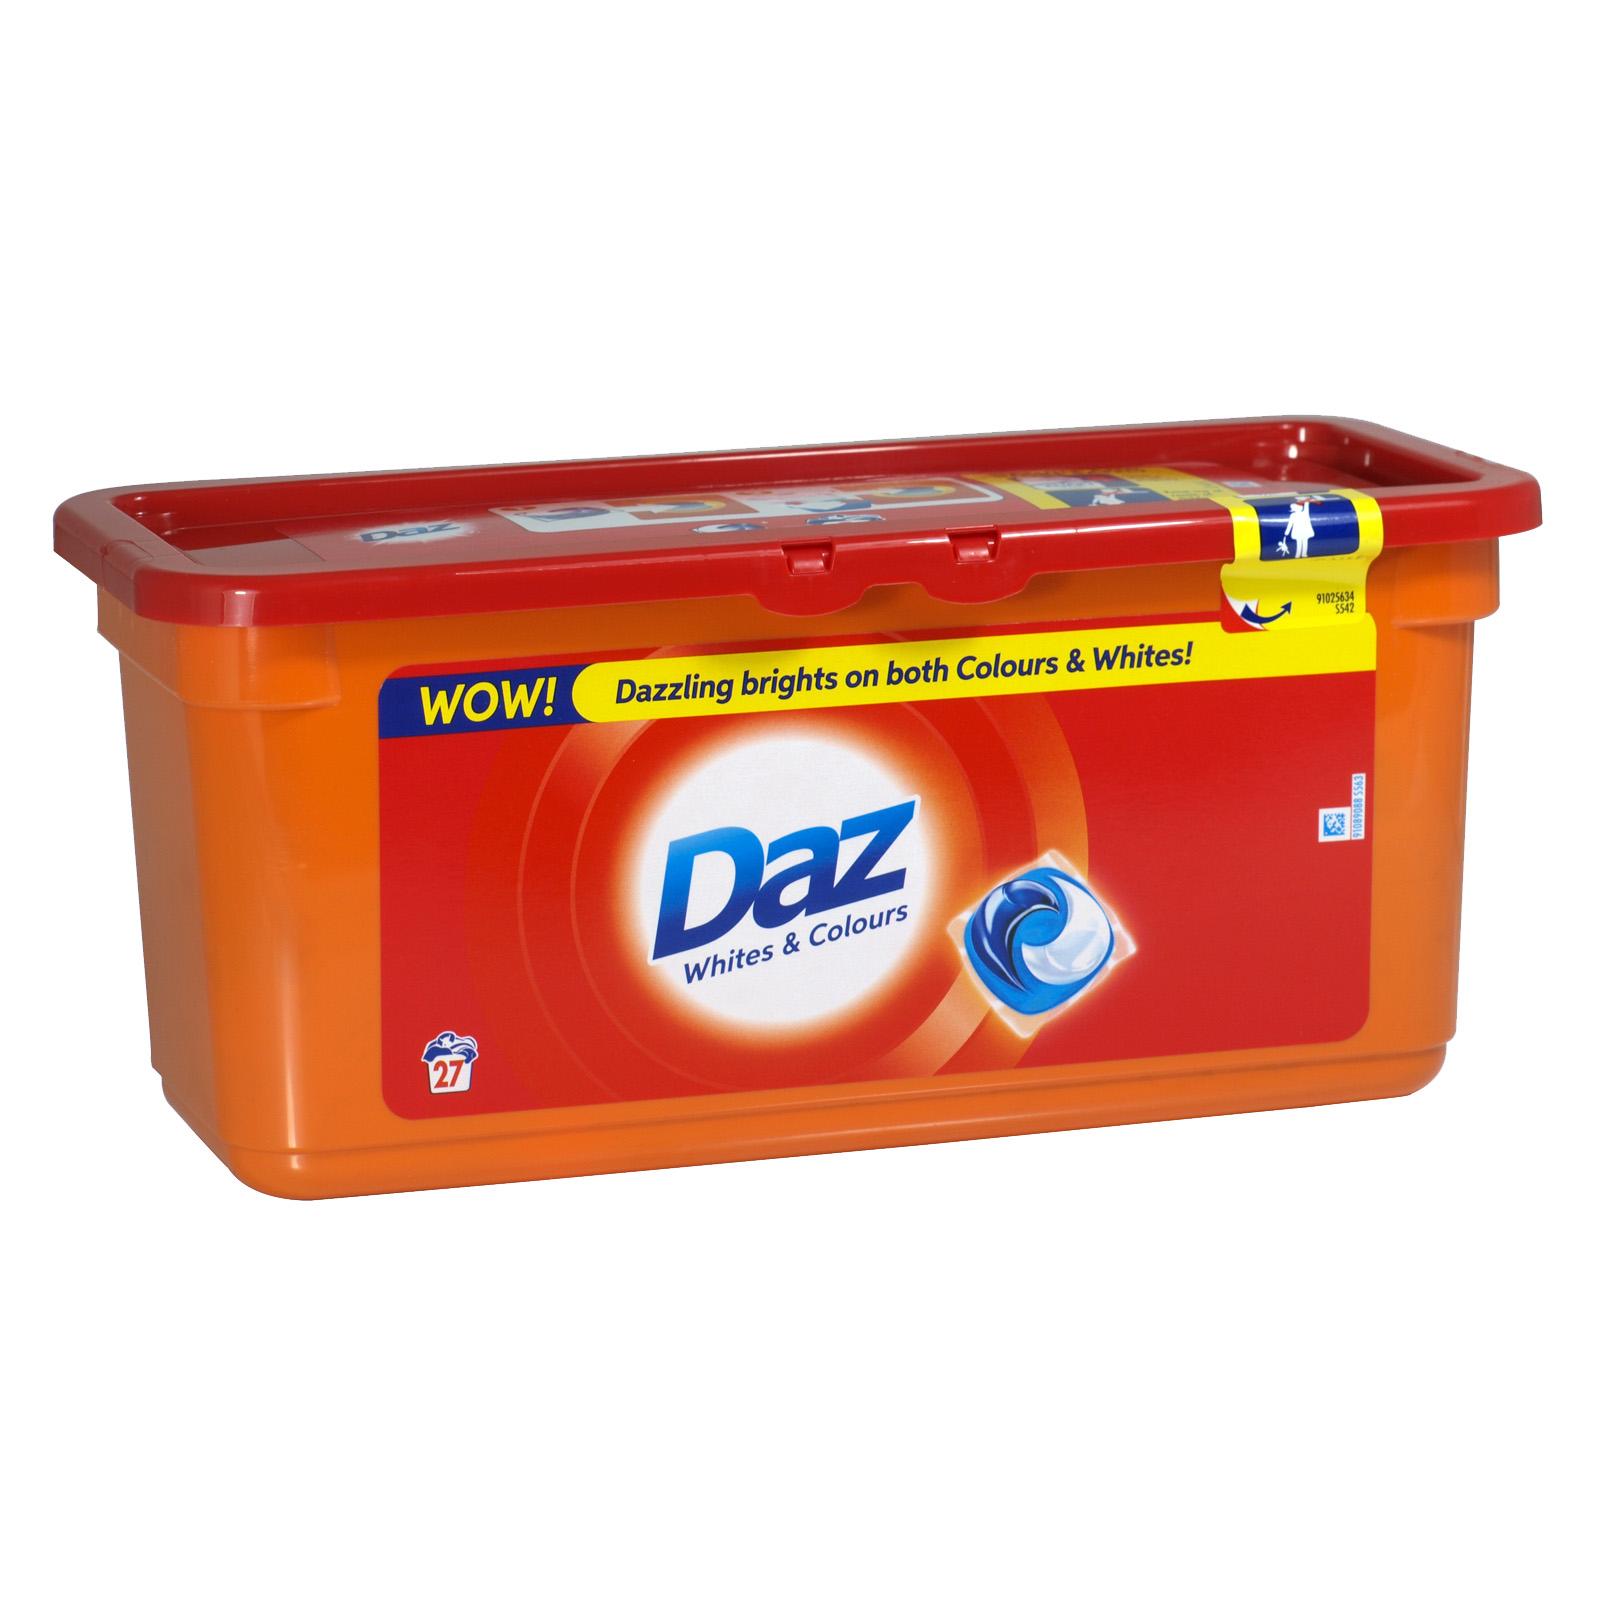 DAZ GO PODS 27 WASH 3 IN 1 WHITES & COLOURS X3